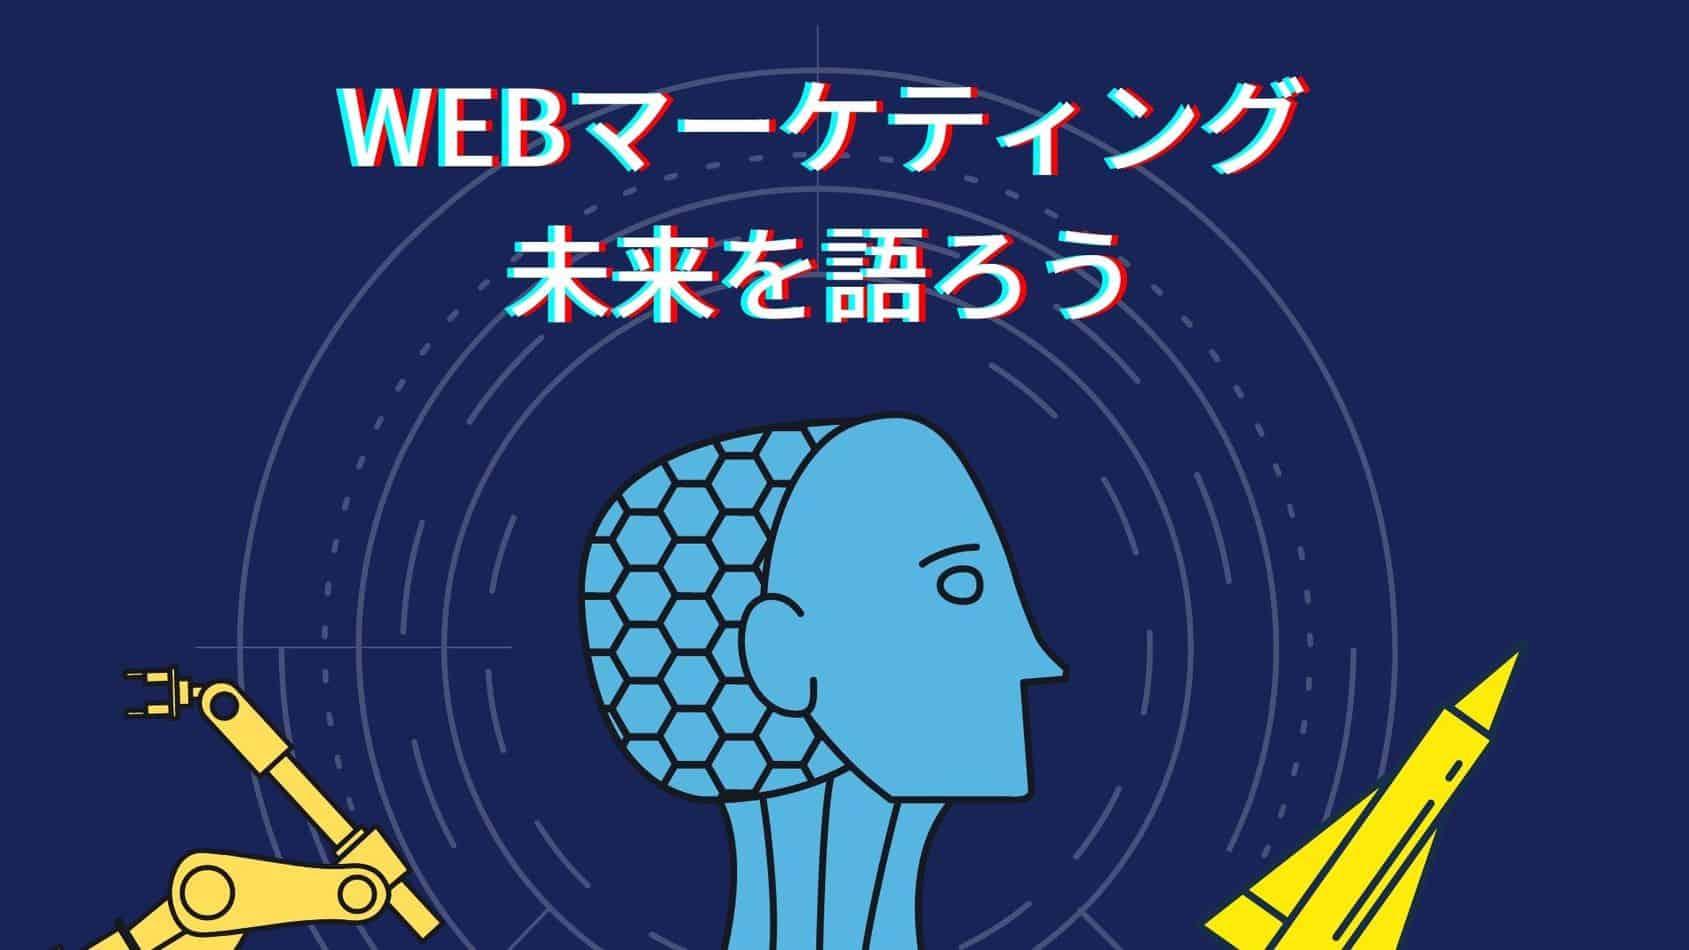 Webマーケティングの仕事はなくなるのかと将来性を予測